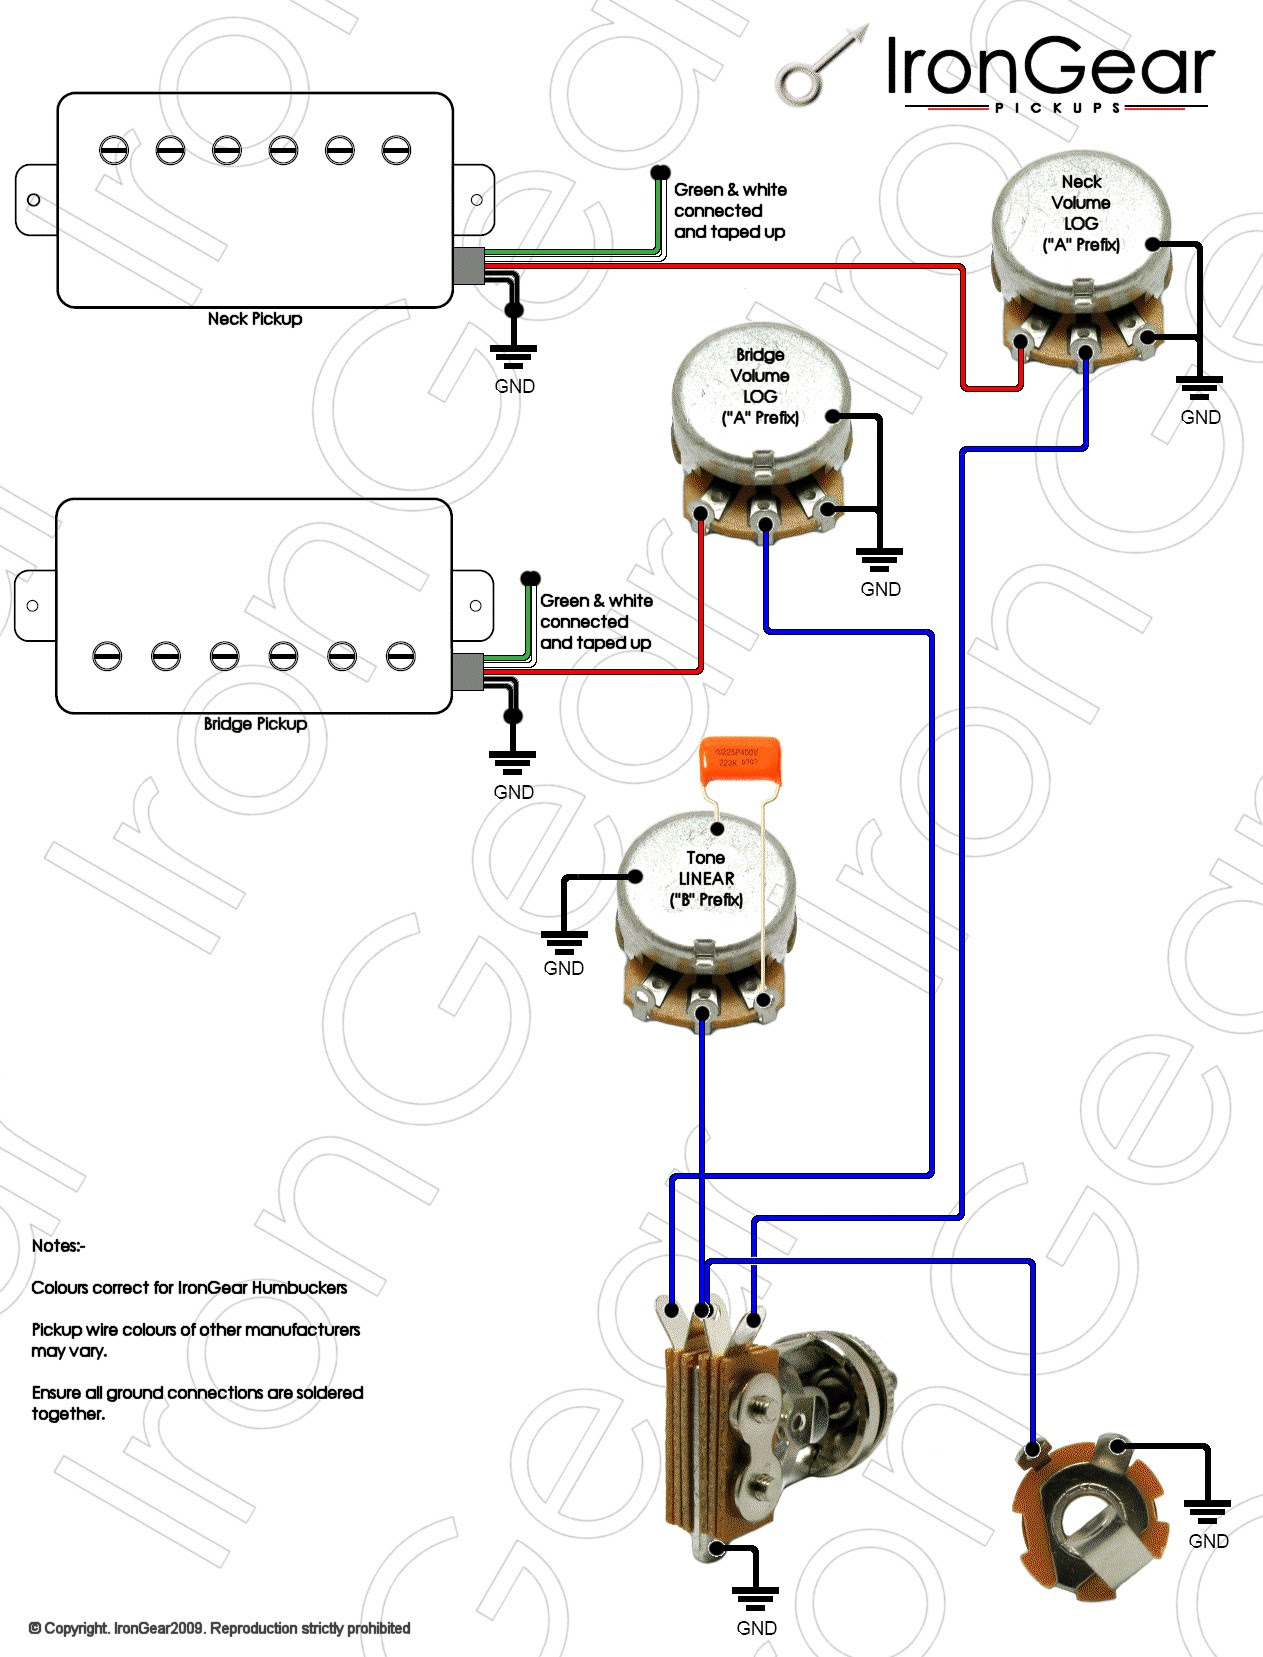 Diagram Emg 1 Volume Wiring Diagram Full Version Hd Quality Wiring Diagram Schematicny2j Eticaenergetica It